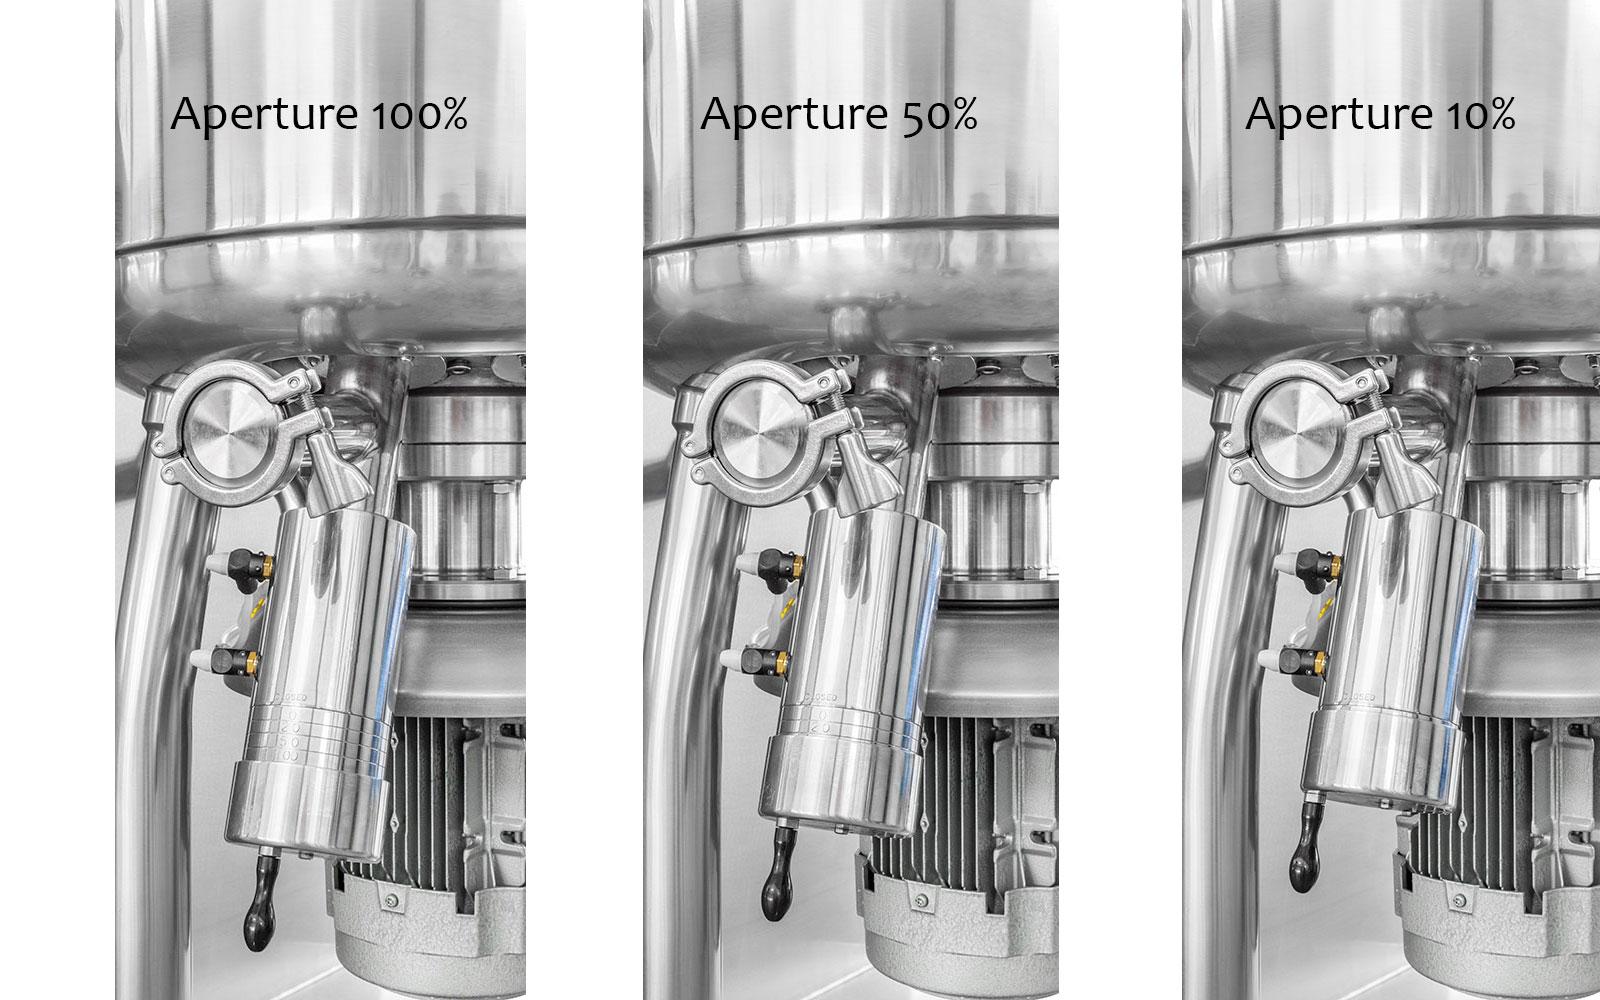 valve-aperture-text